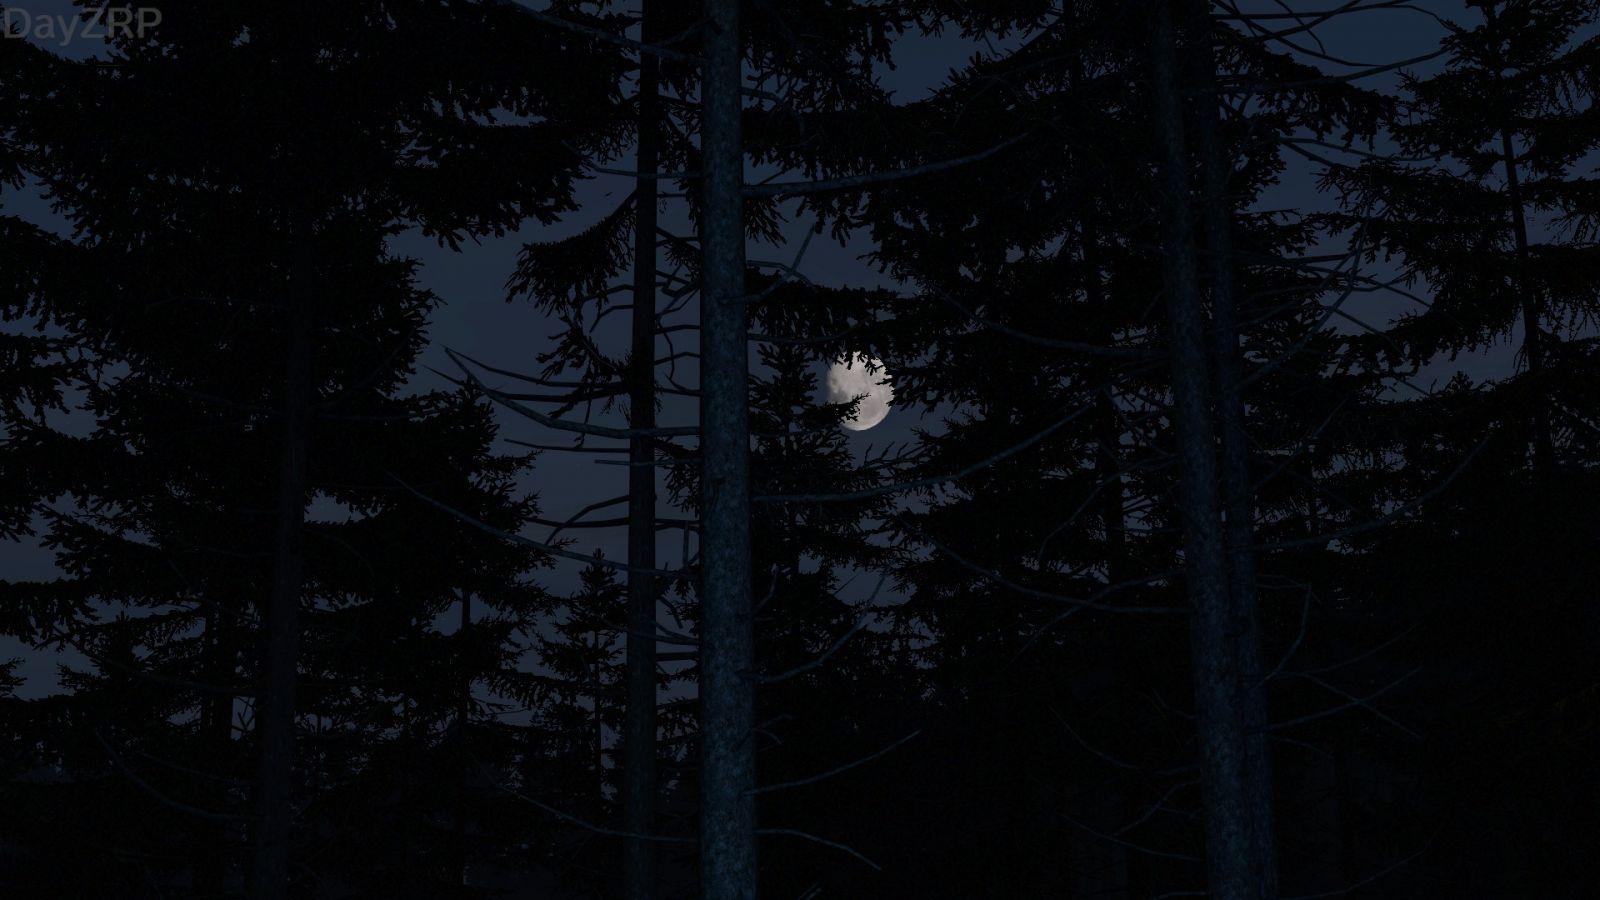 The hidden moon